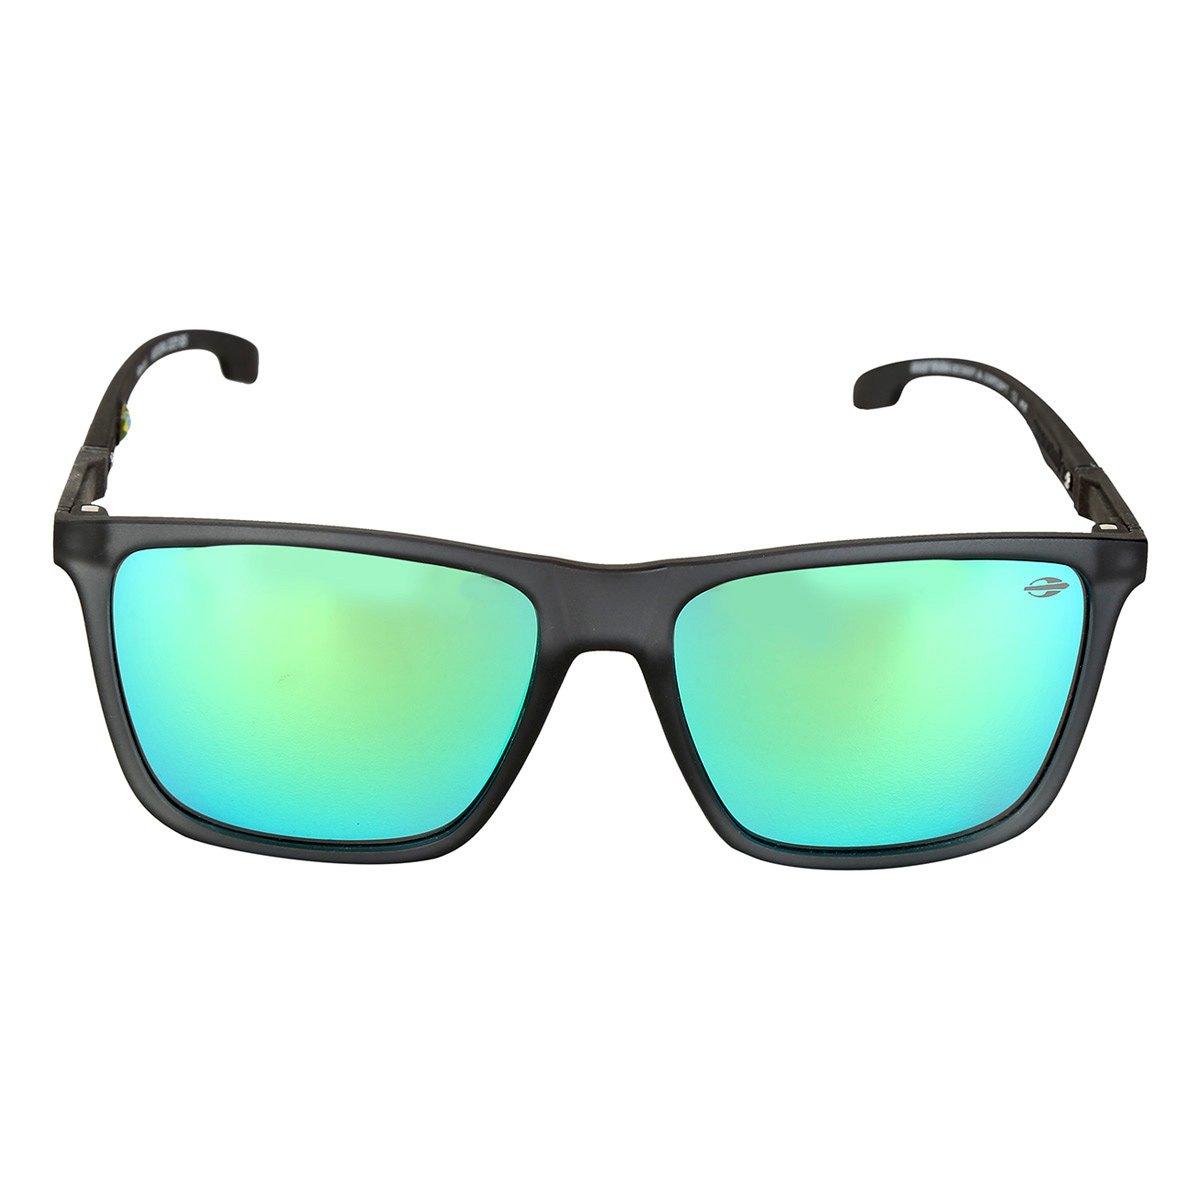 Óculos de Sol Mormaii Hawaii Masculino - Preto - Compre Agora   Netshoes 3f1d5479af